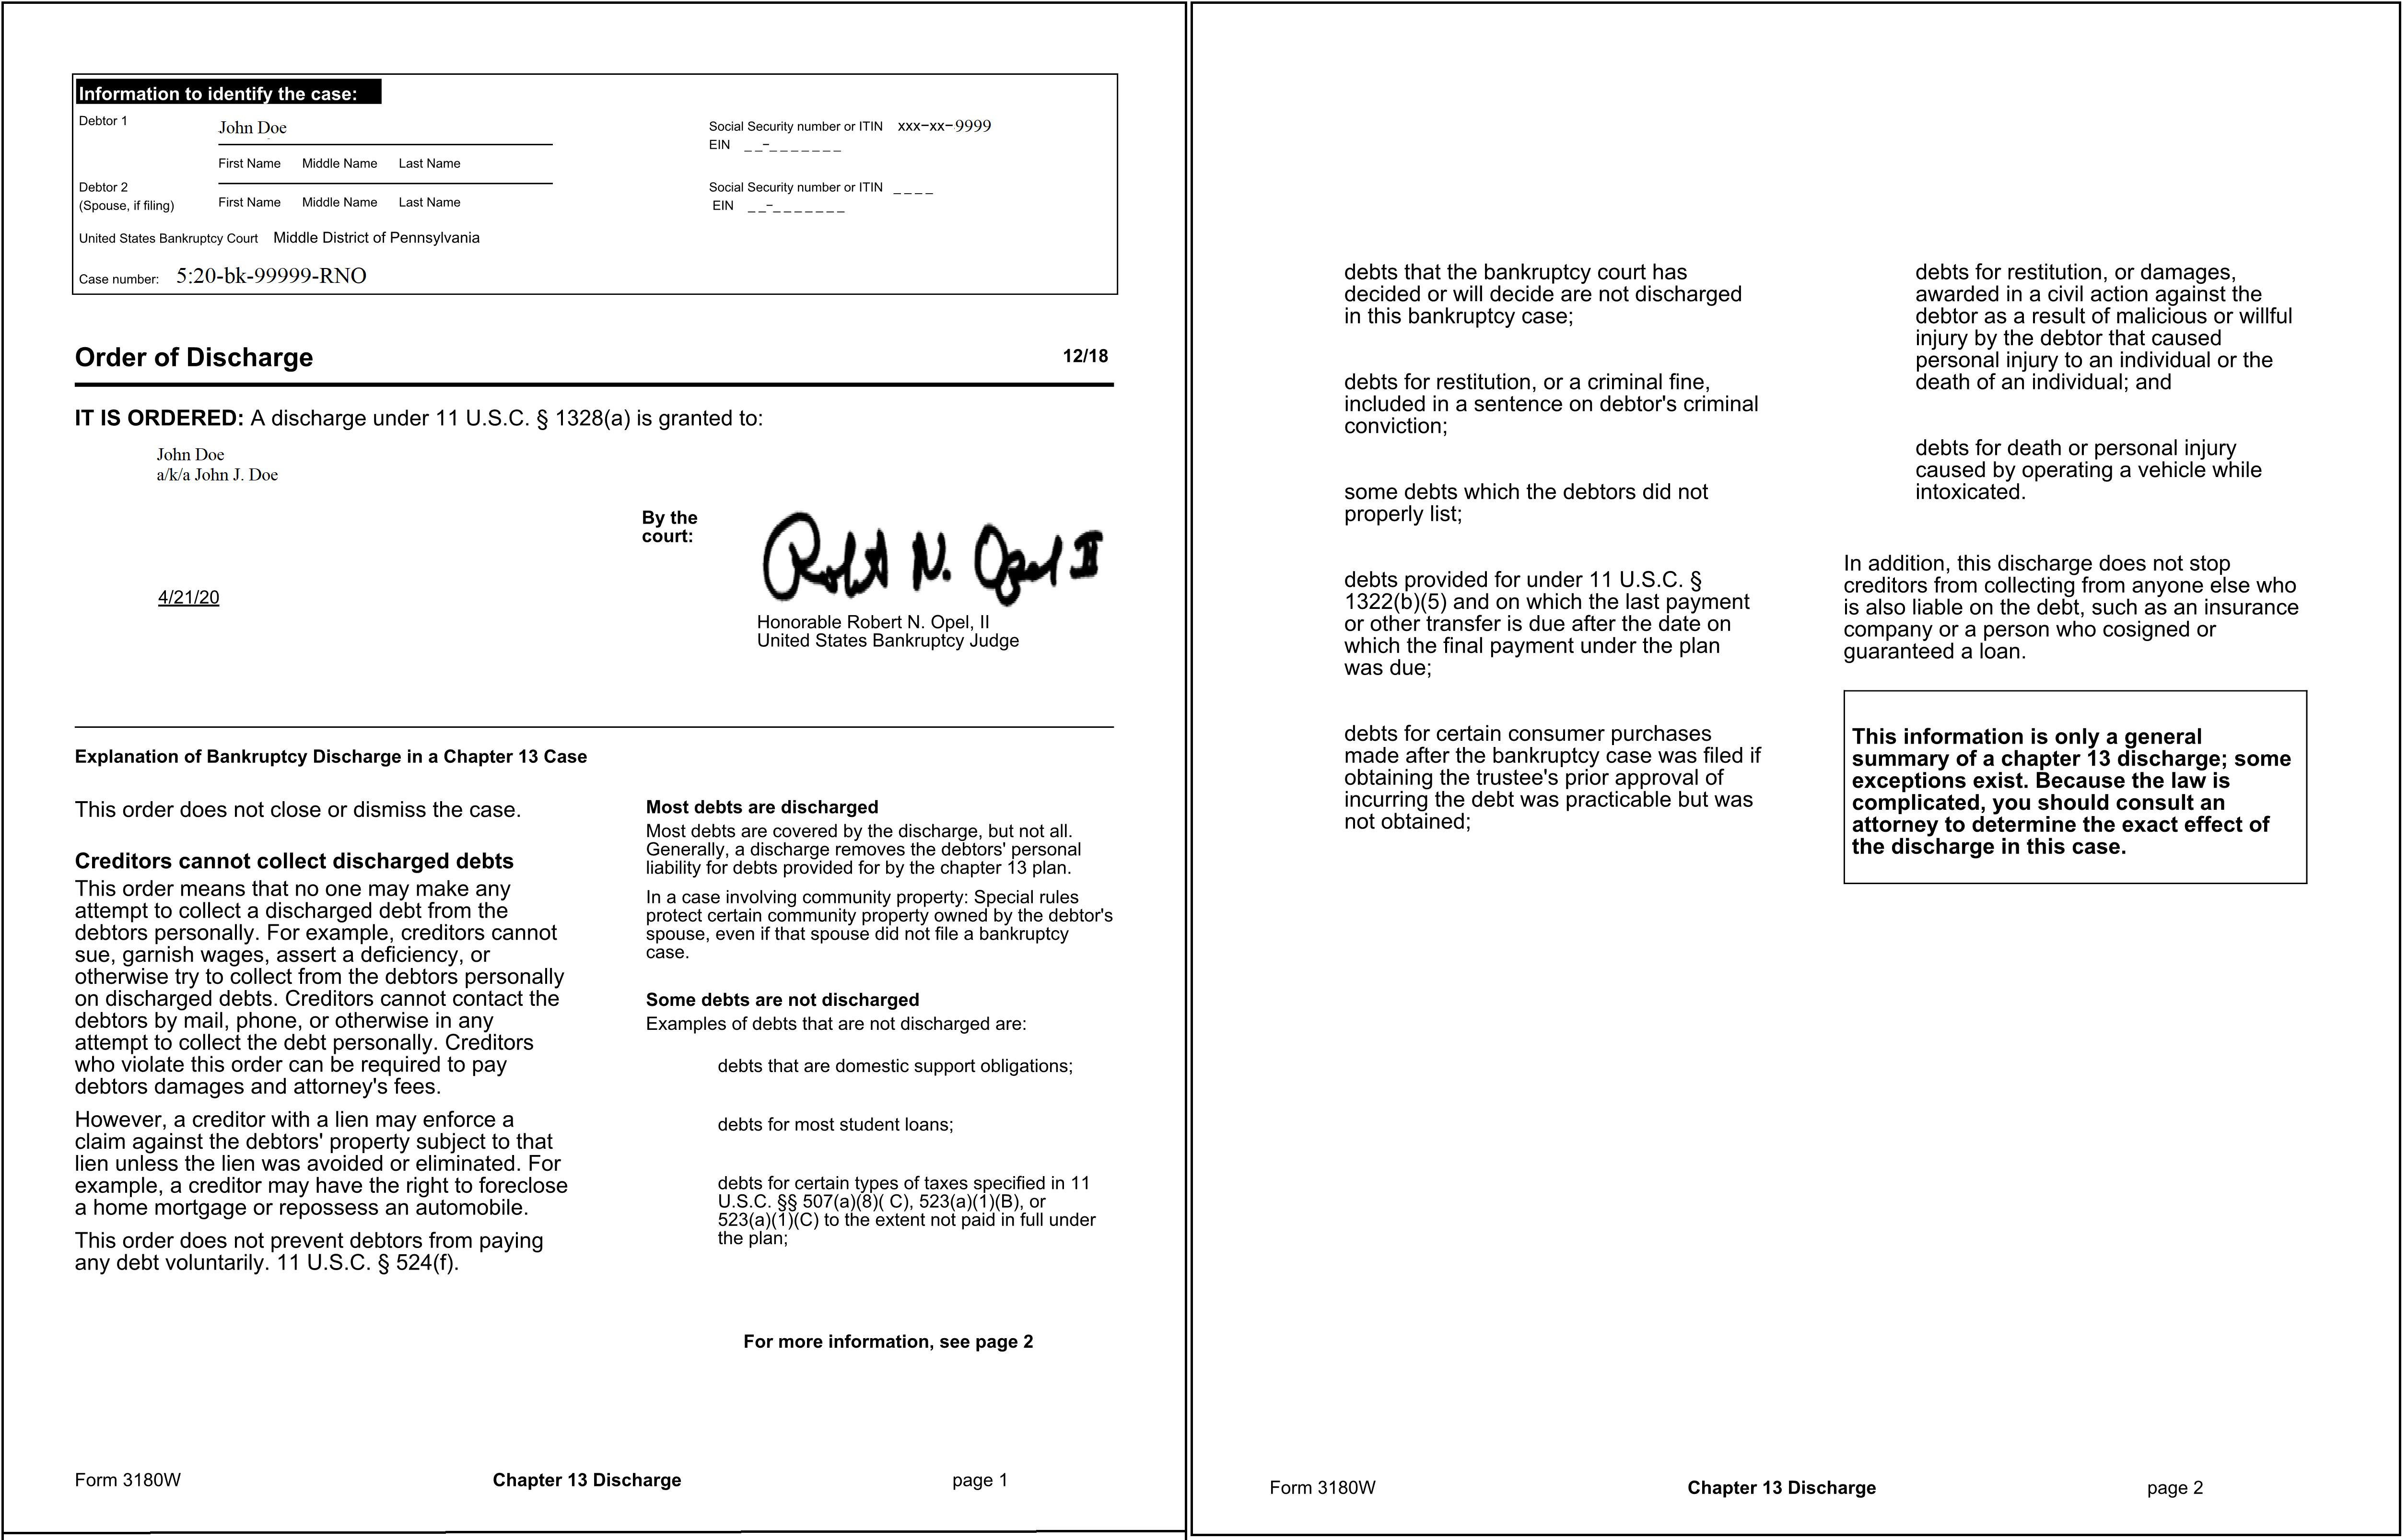 Image: Sample Chapter 13 Discharge Order